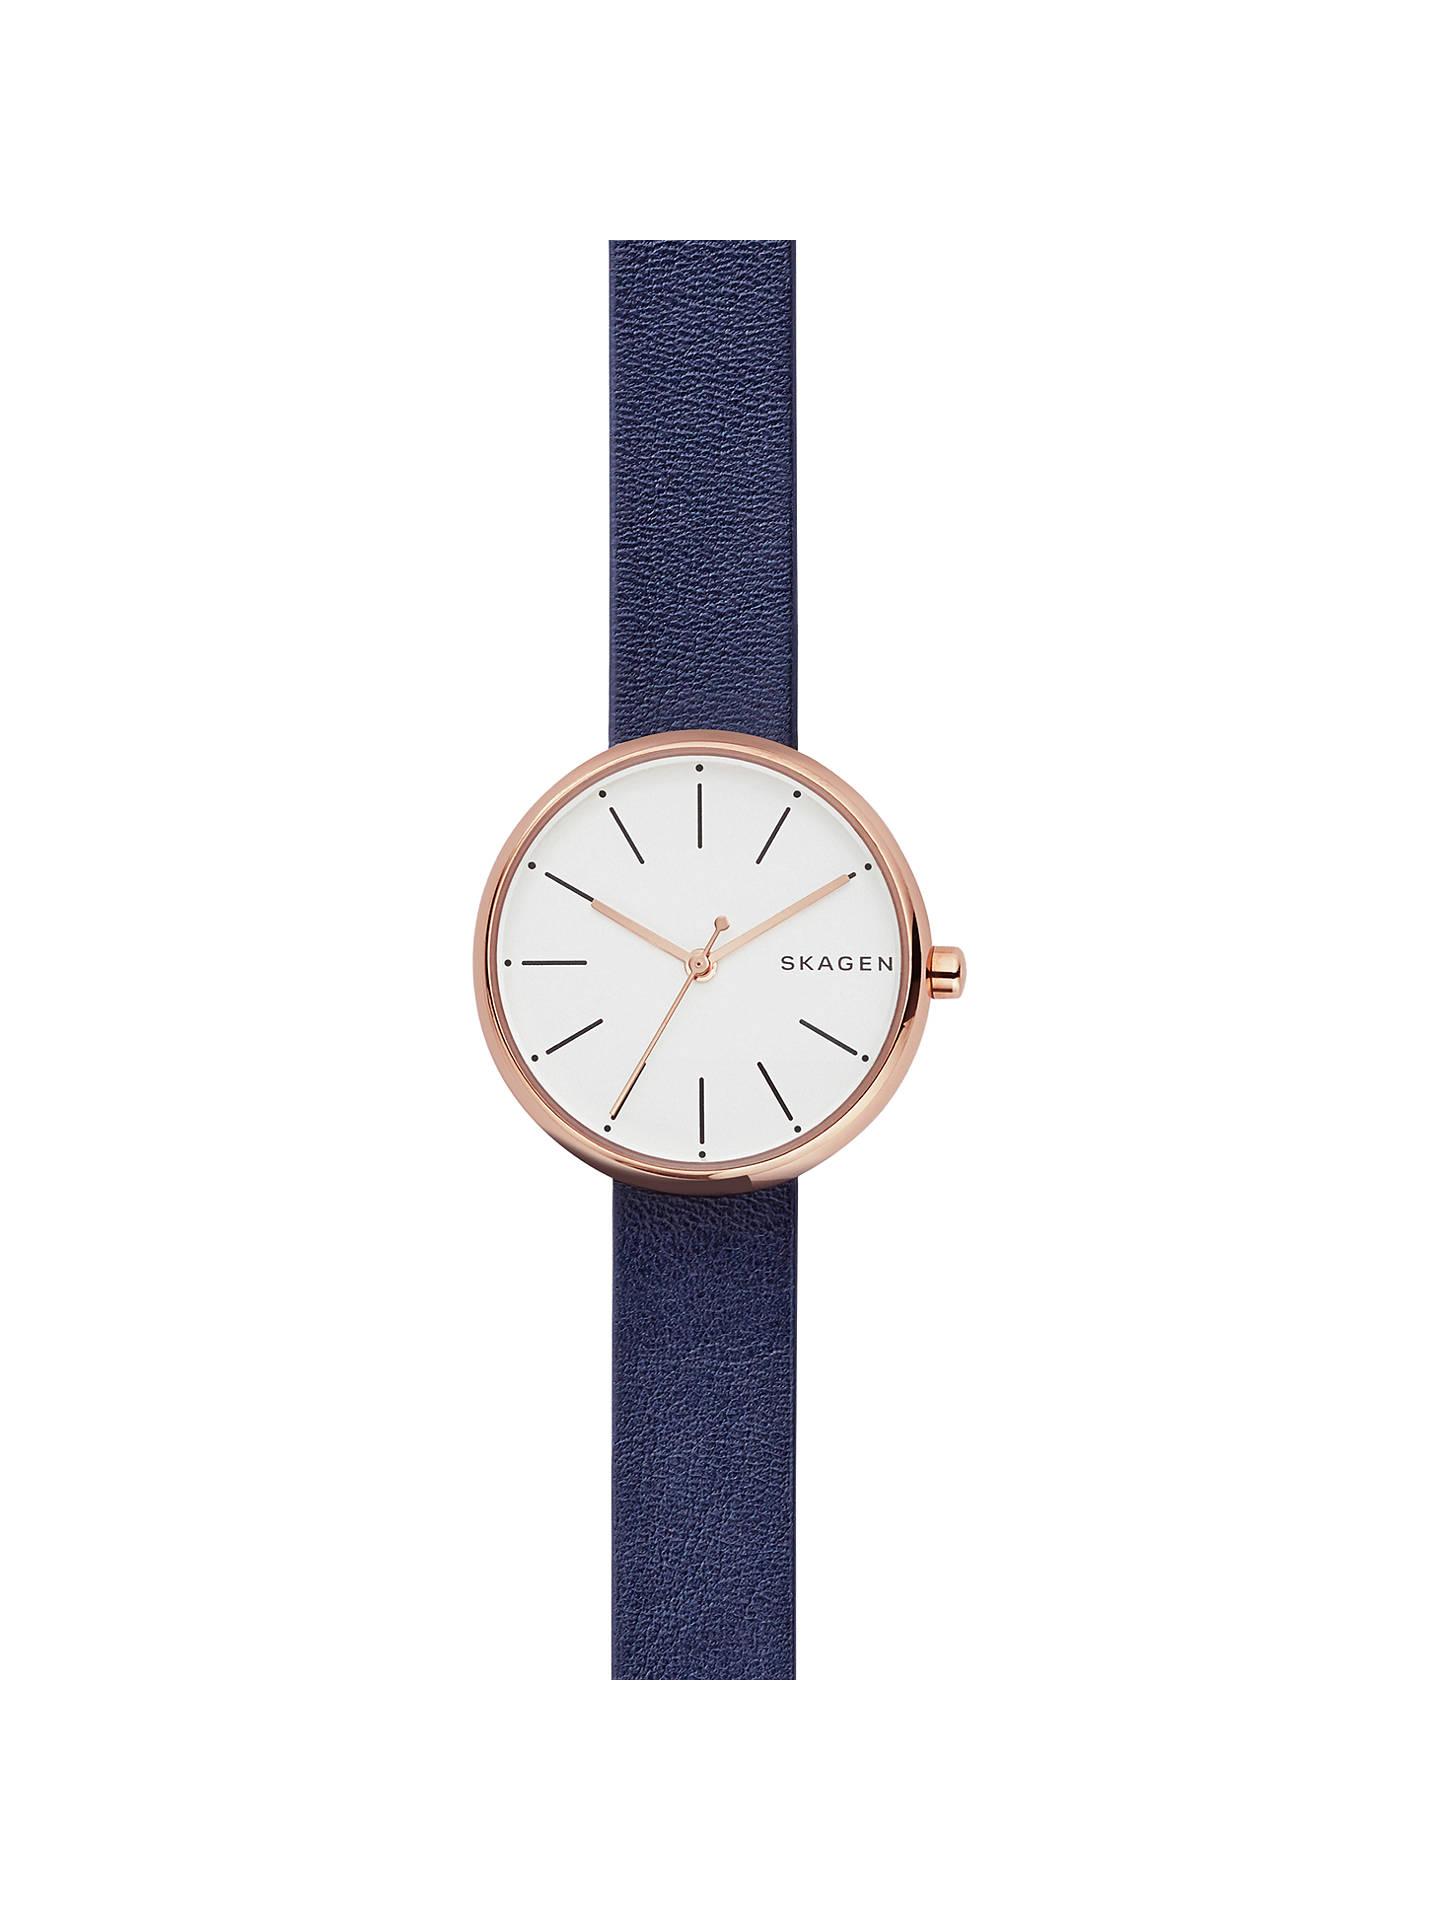 07e32756db6da Skagen Women s Signatur Leather Strap Watch at John Lewis   Partners